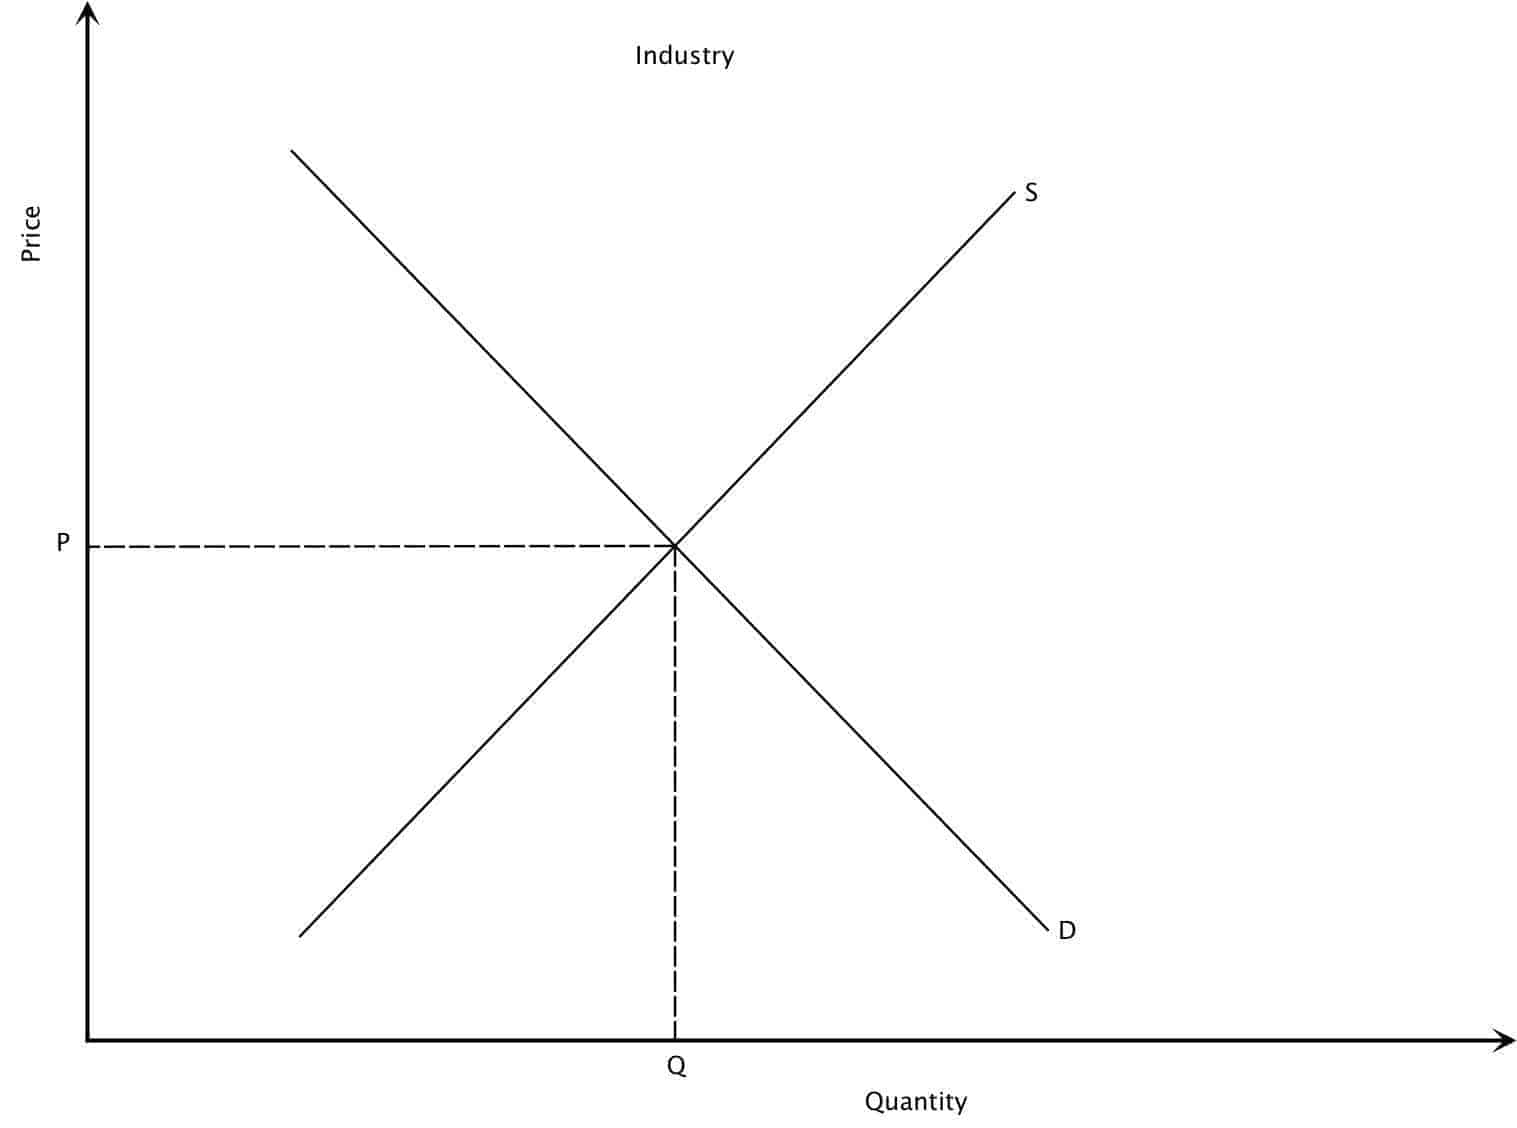 perfect competition short run industrial equilibrium